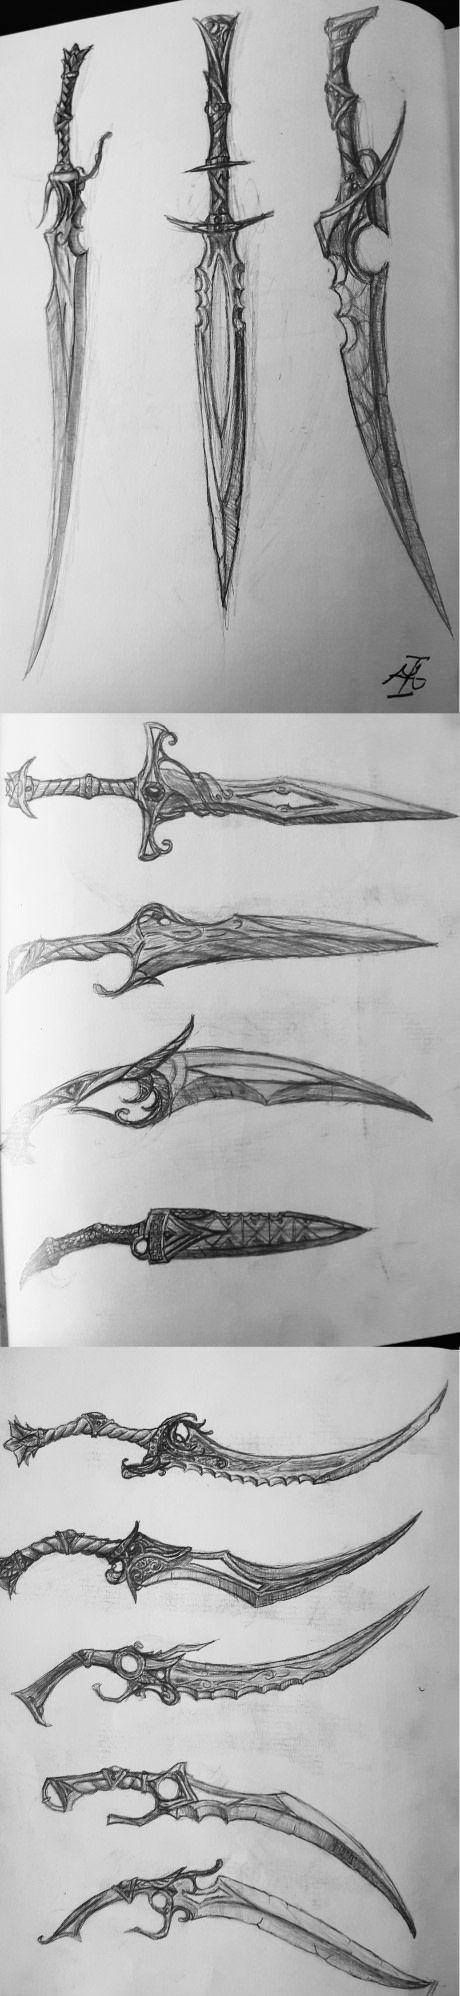 Some sword concepts in my sketchbook. Enjoy!